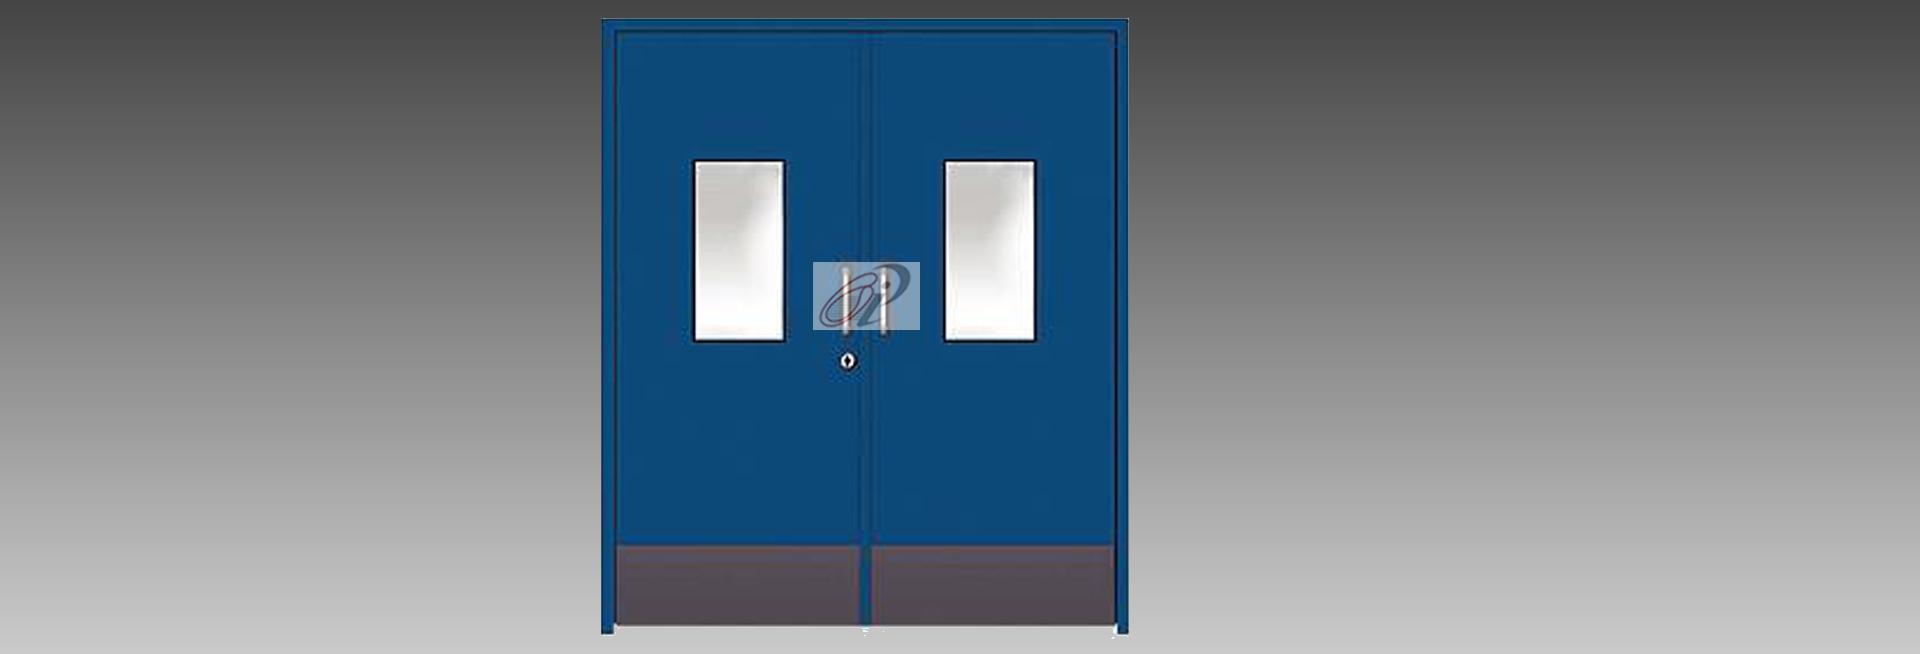 Puf Doors Puf Cleanroom Doors Puf Coldroom Doors Mumbai